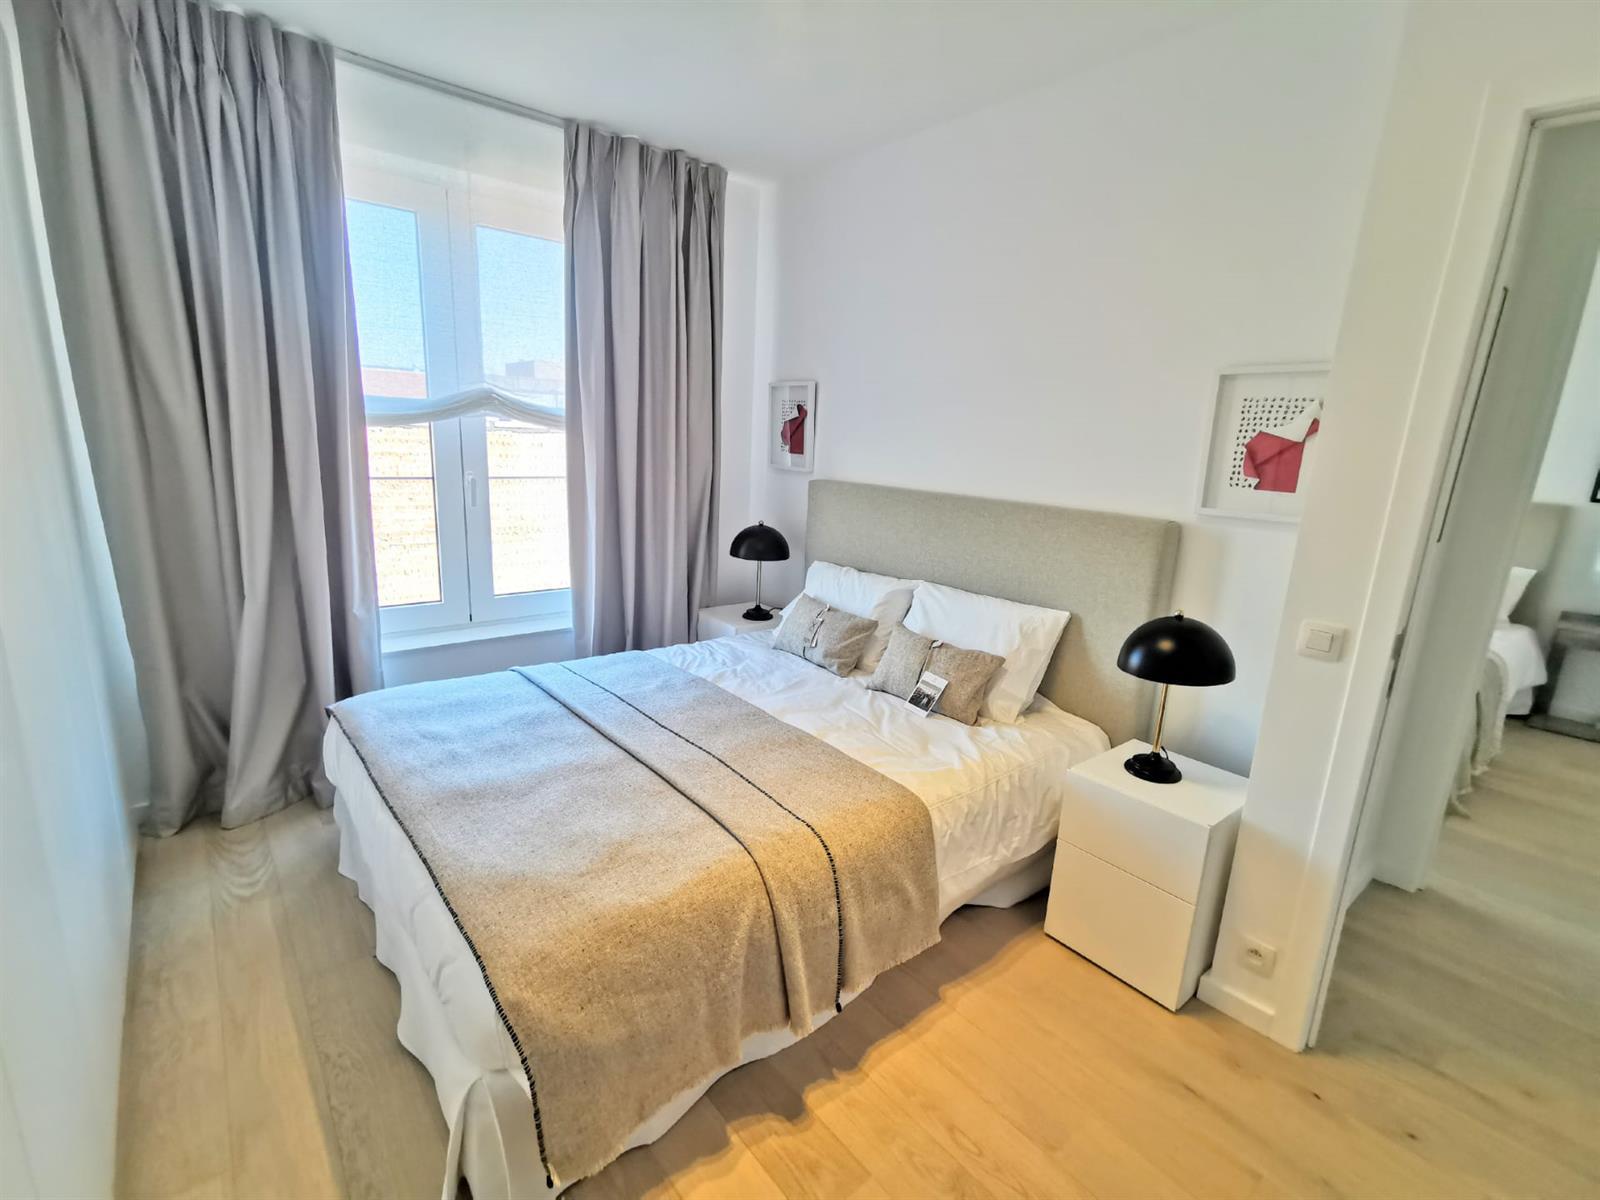 Appartement - Woluwe-Saint-Lambert - #4455516-8